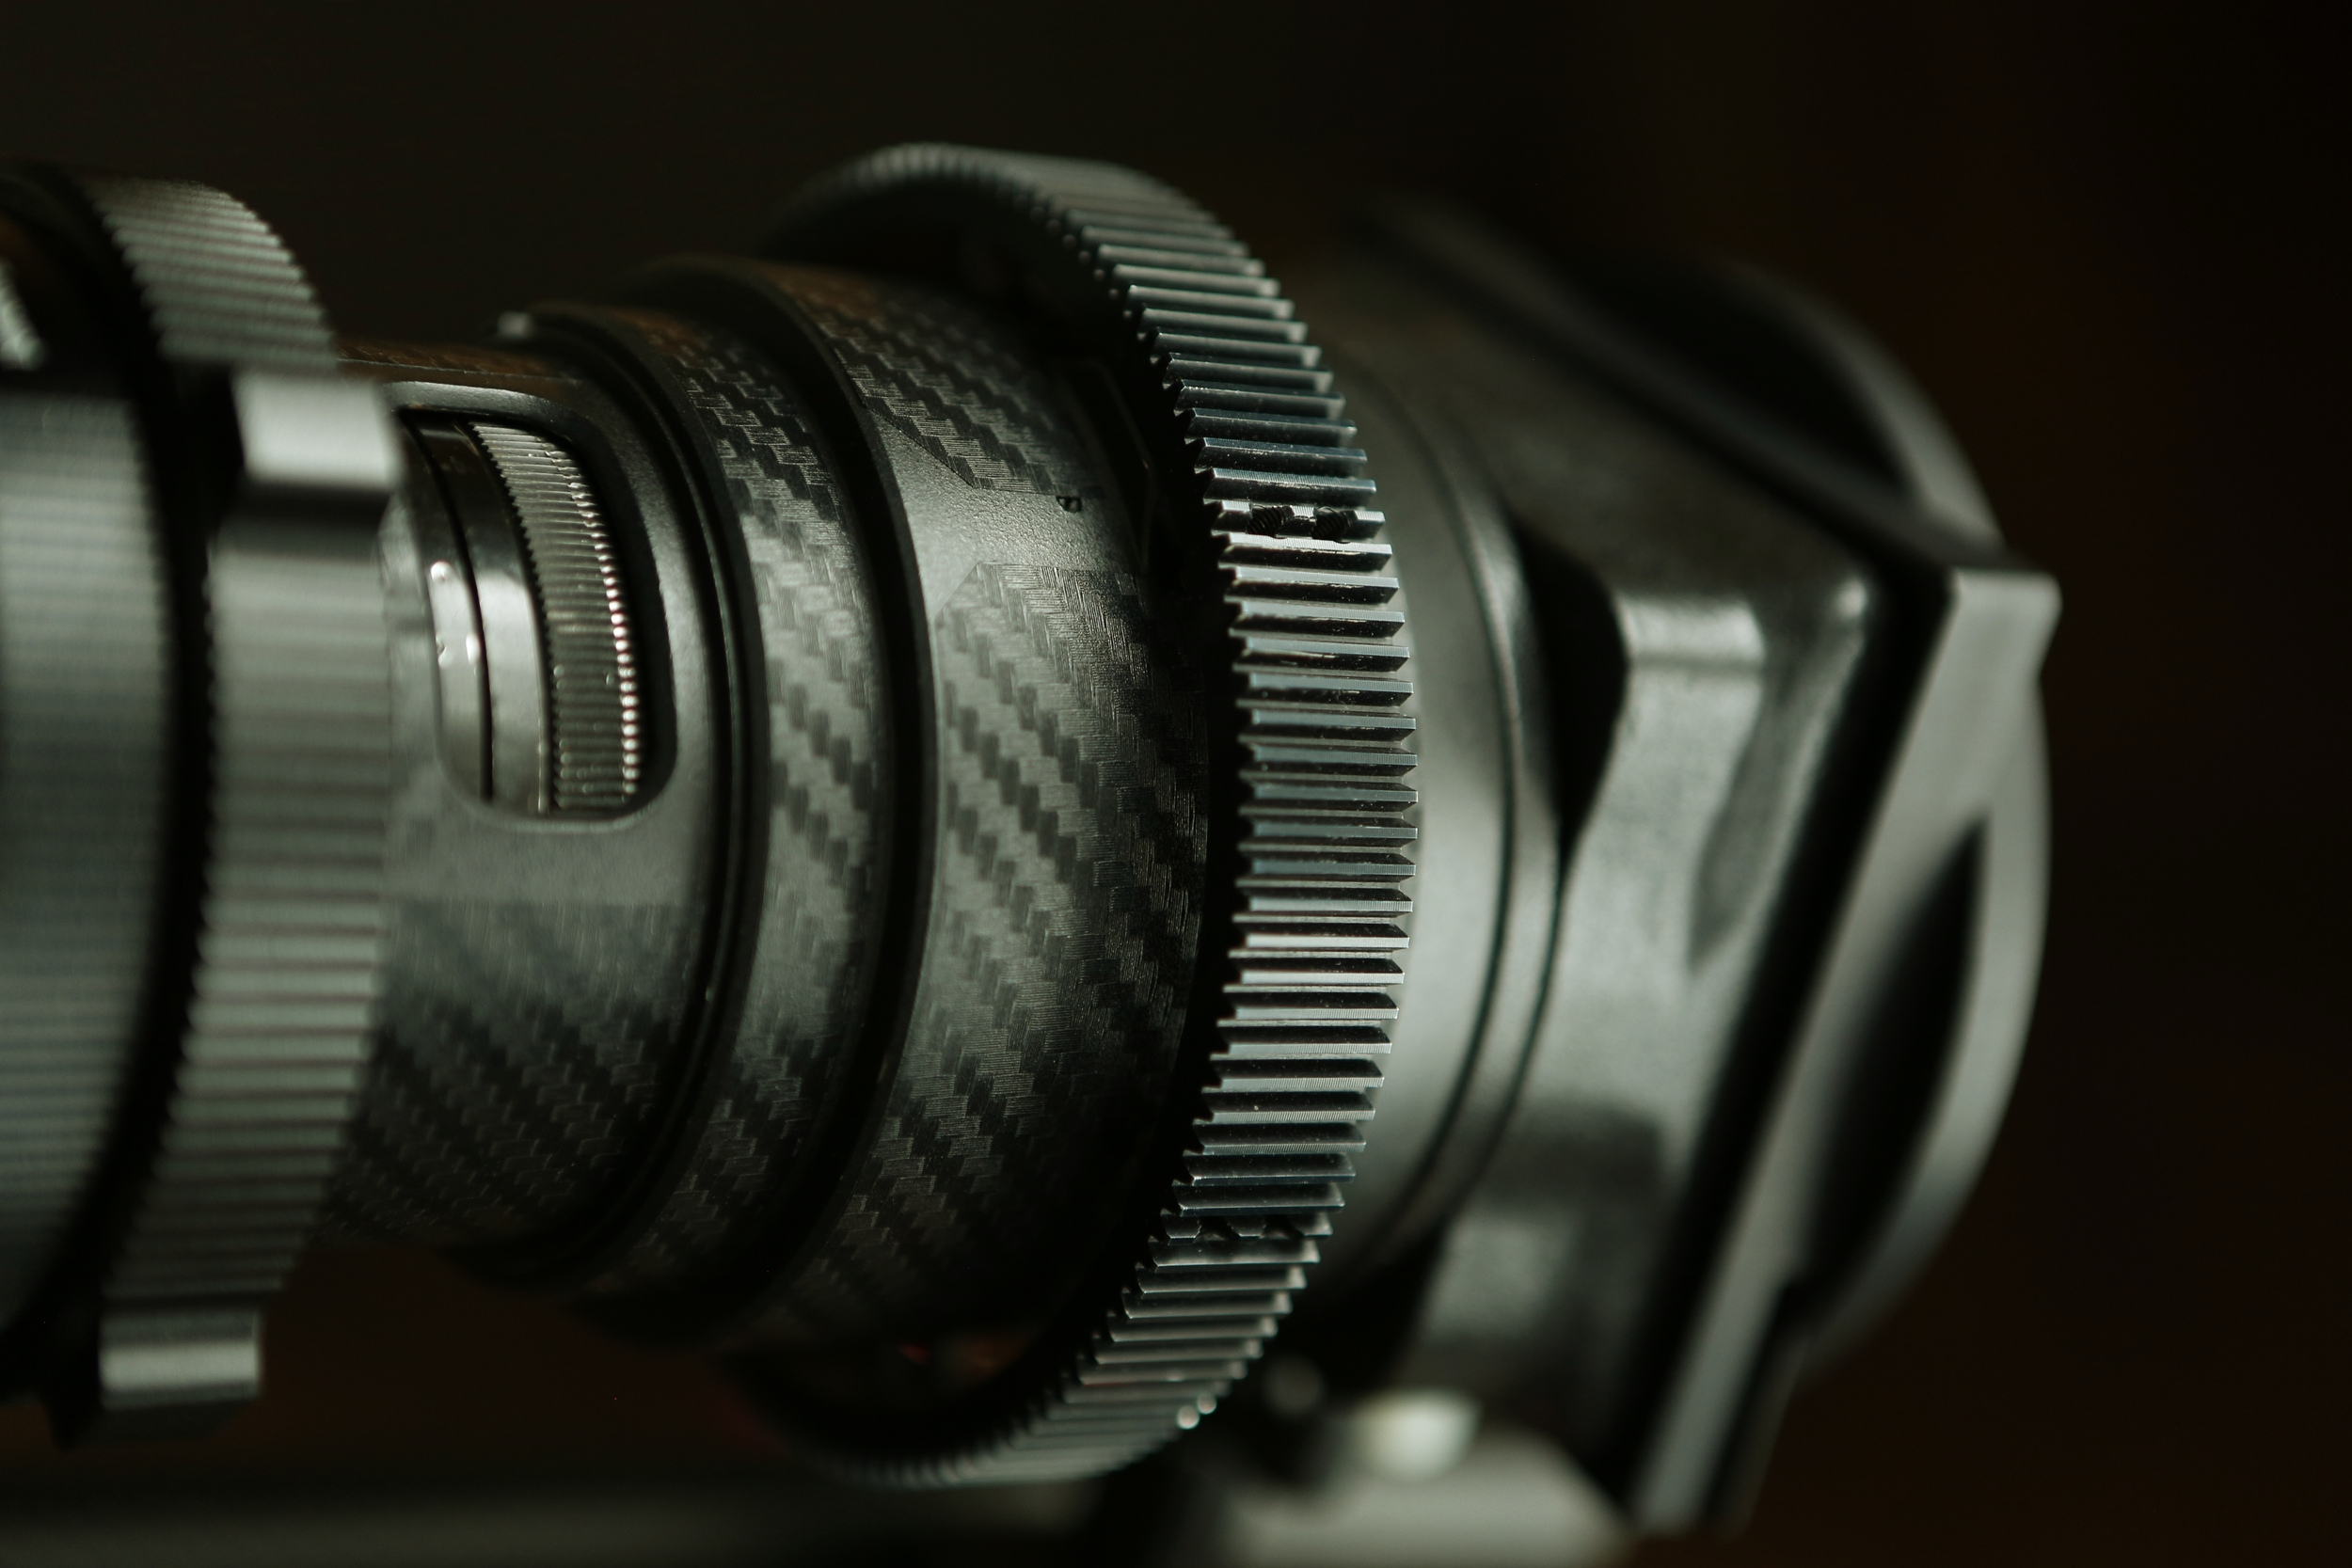 Lomo 50mm f2.5 Squarefront Anamorphic Lens